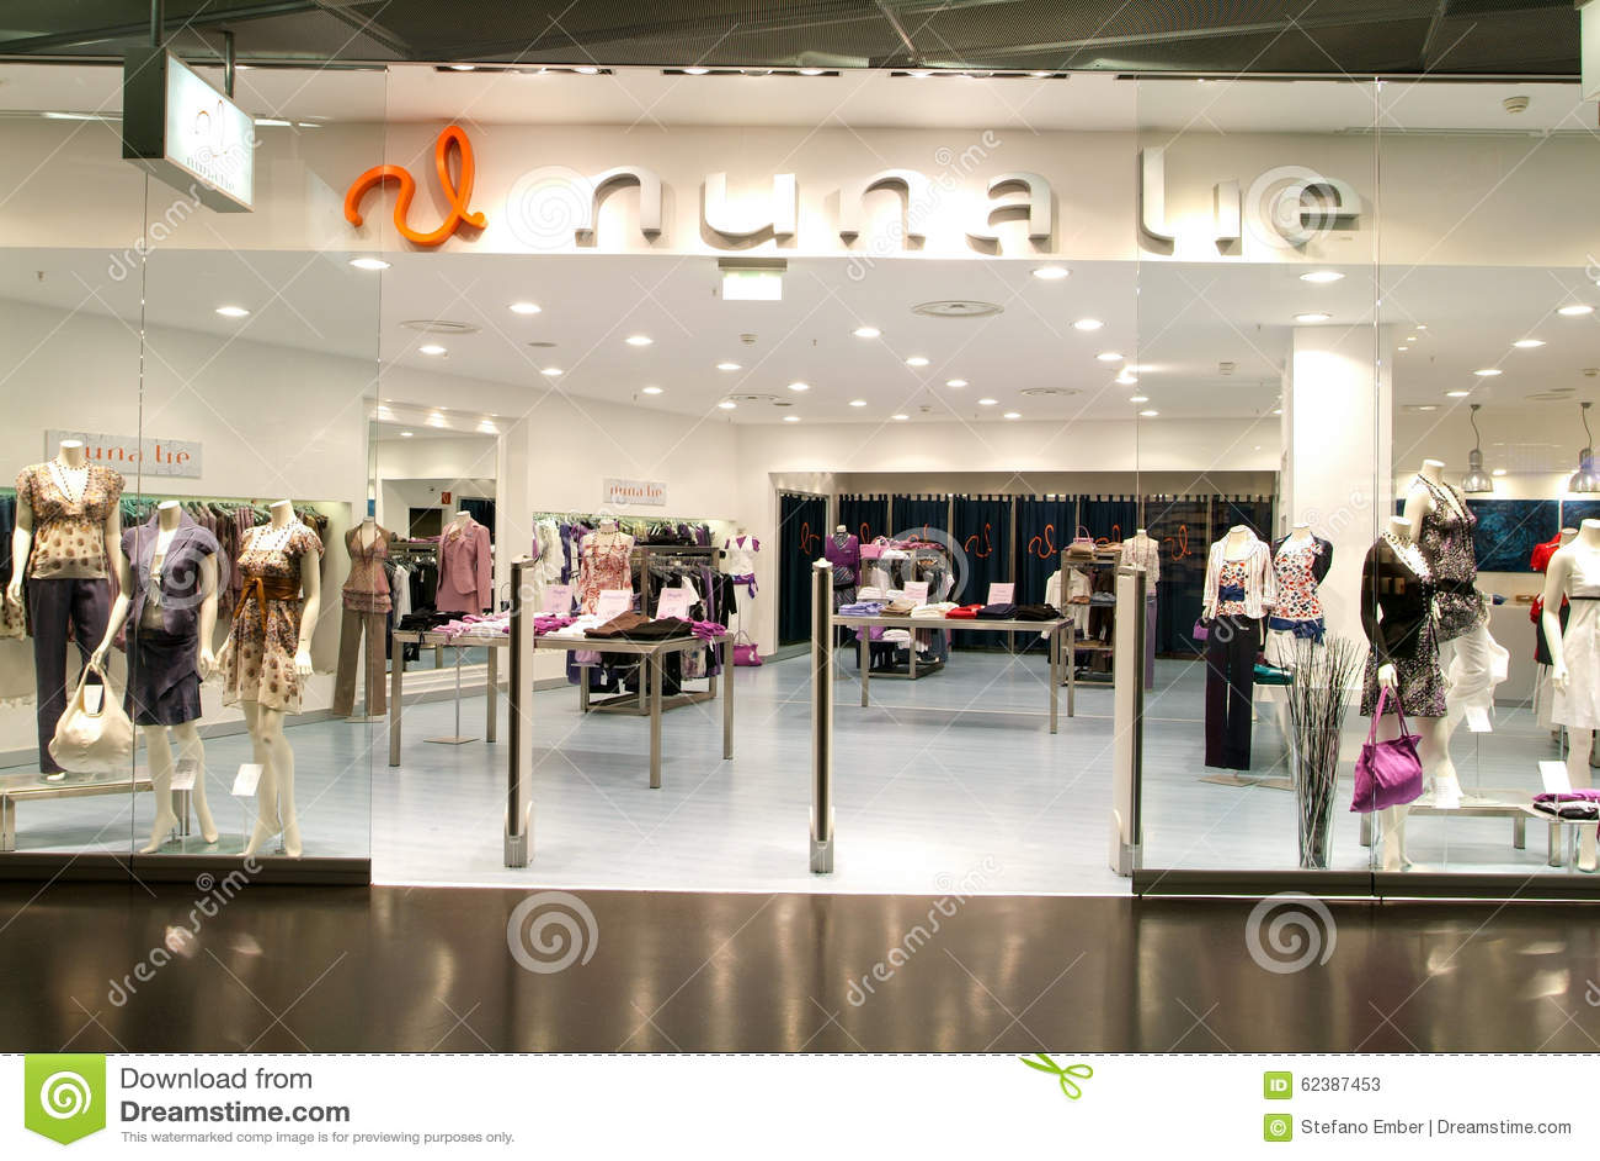 Interior Of Nuna Lie Fashion Clothes Store Editorial Stock Photo